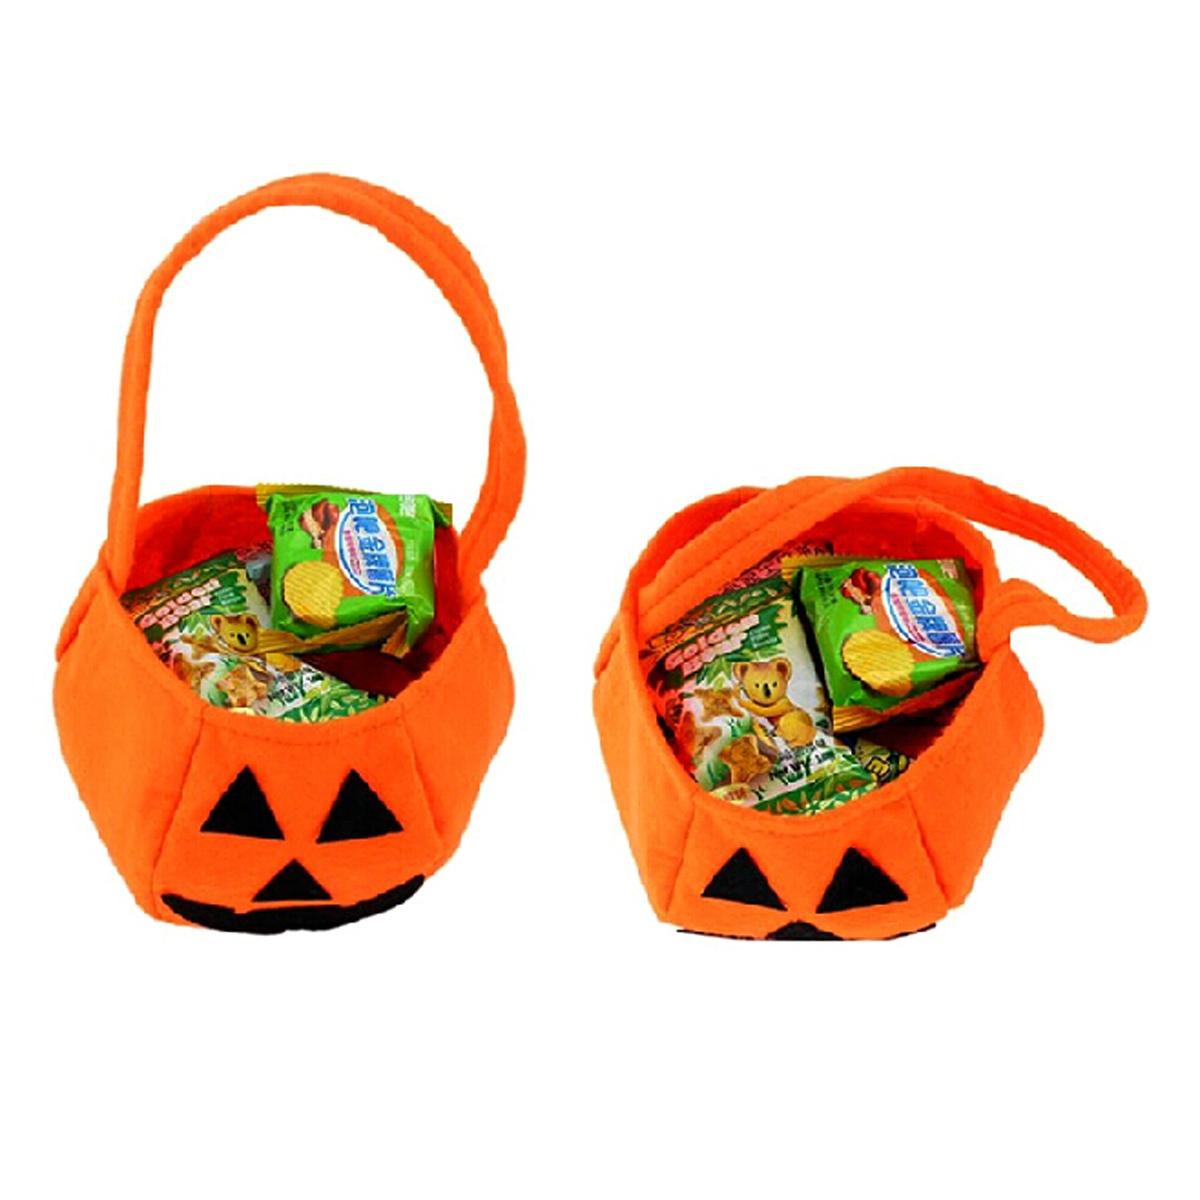 Pumpkin Candy Bag Handbag Halloween Holiday Birthday Party Gift Bag